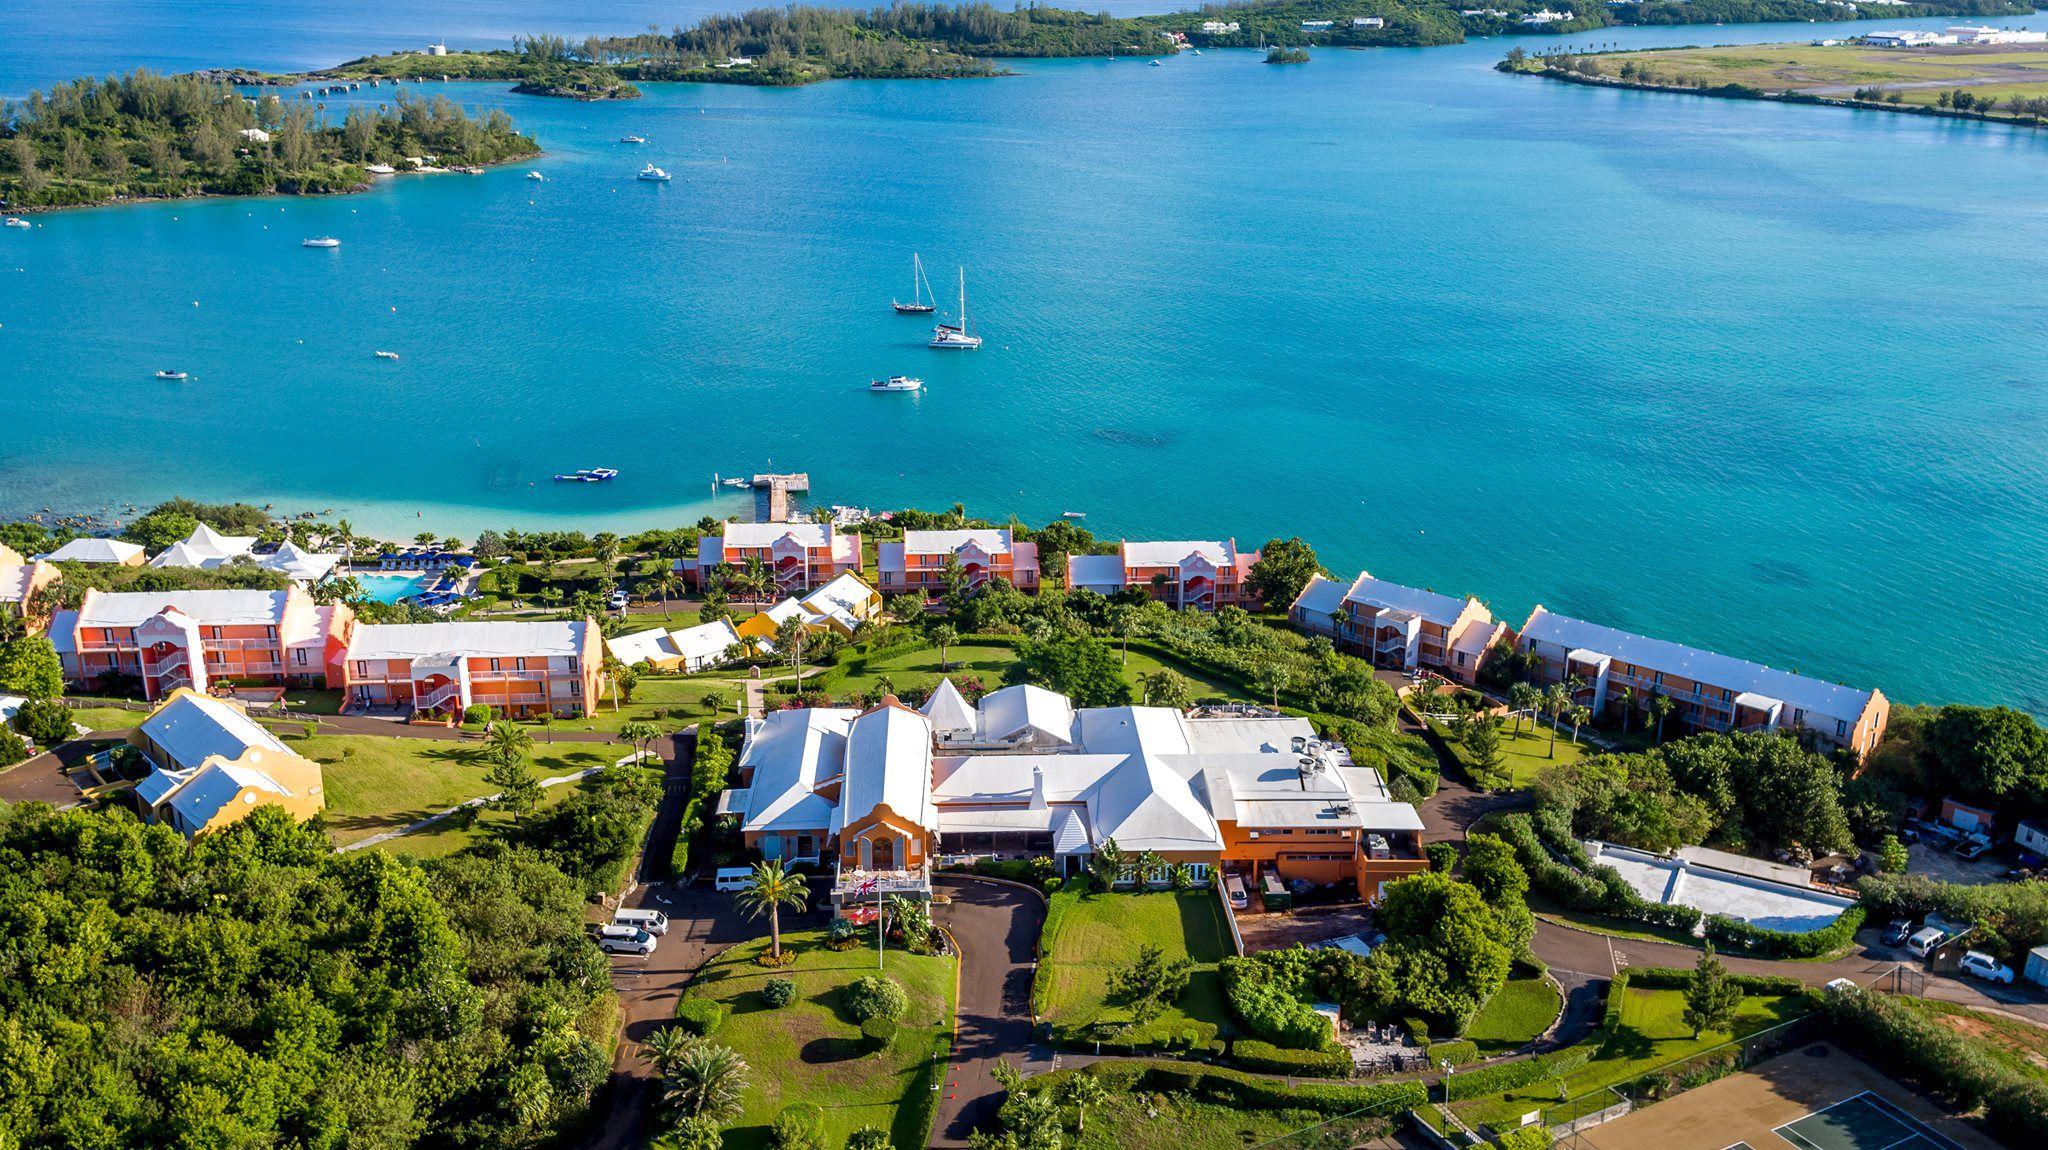 All Inclusive Caribbean Destination Wedding Packages: All-Inclusive Bermuda Destination Wedding Packages